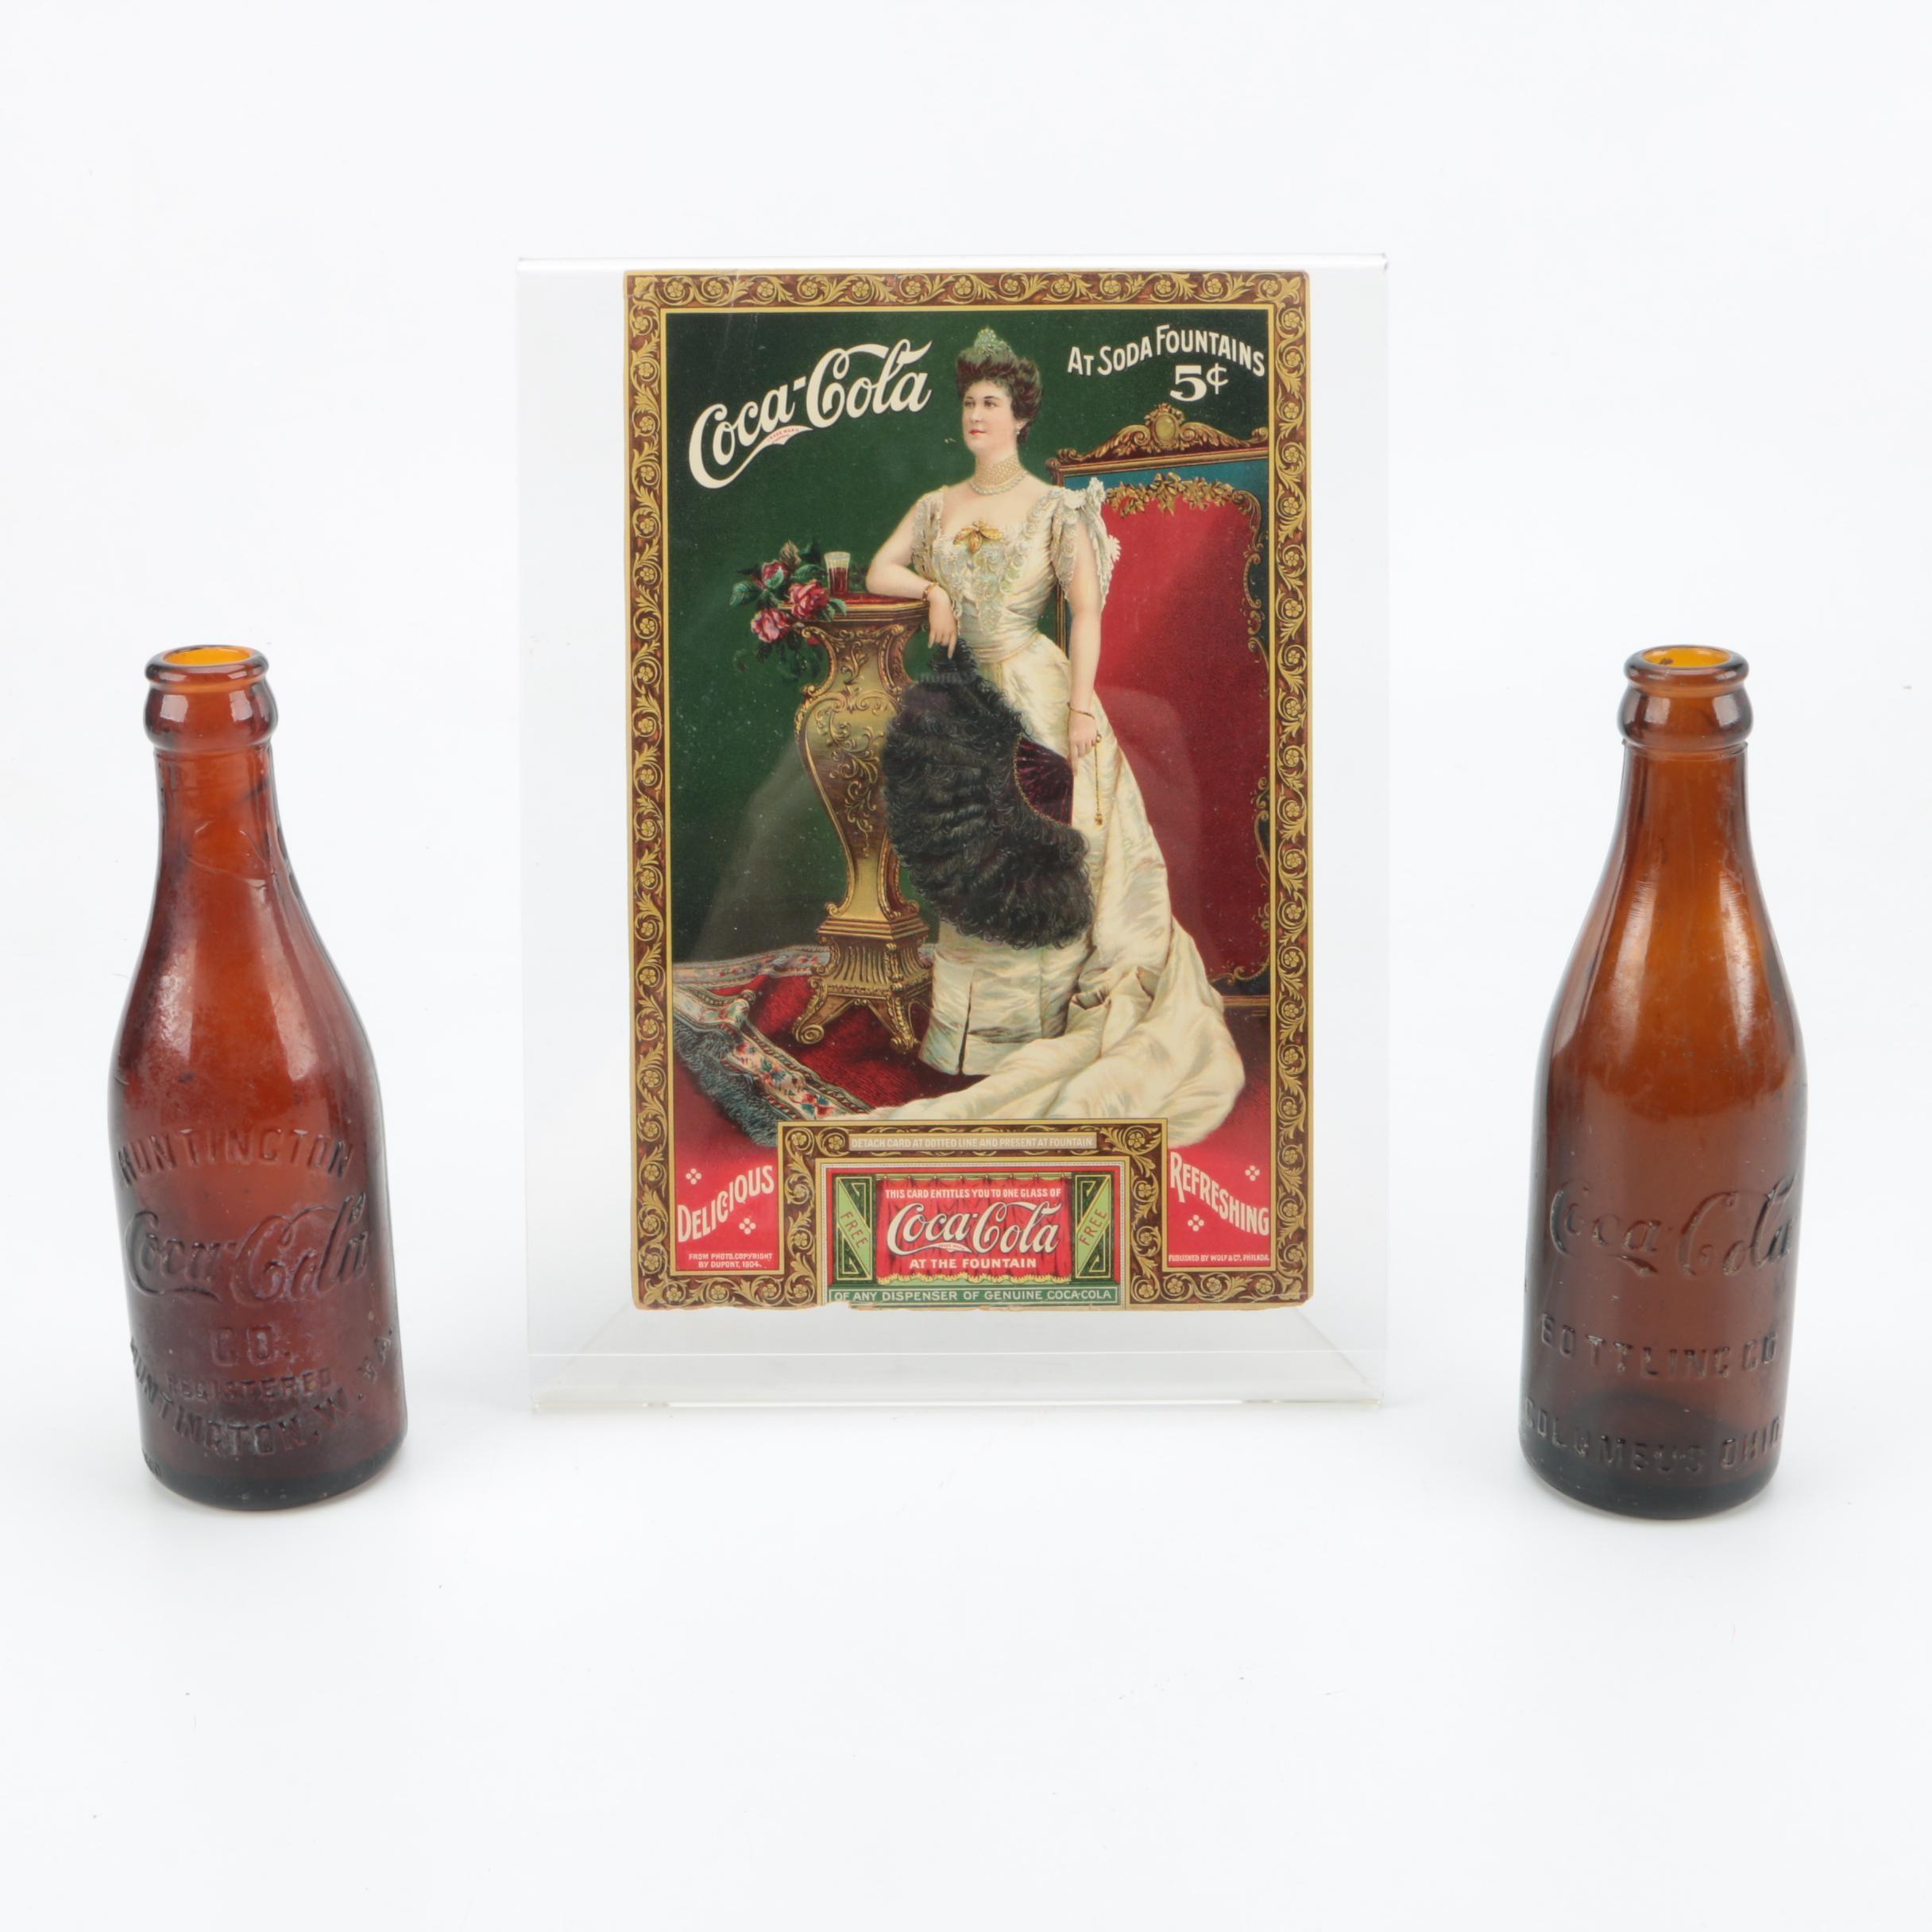 Vintage West VA. Ohio Amber Coca-Cola Bottles and 1905 Lillian Nordica Coupon